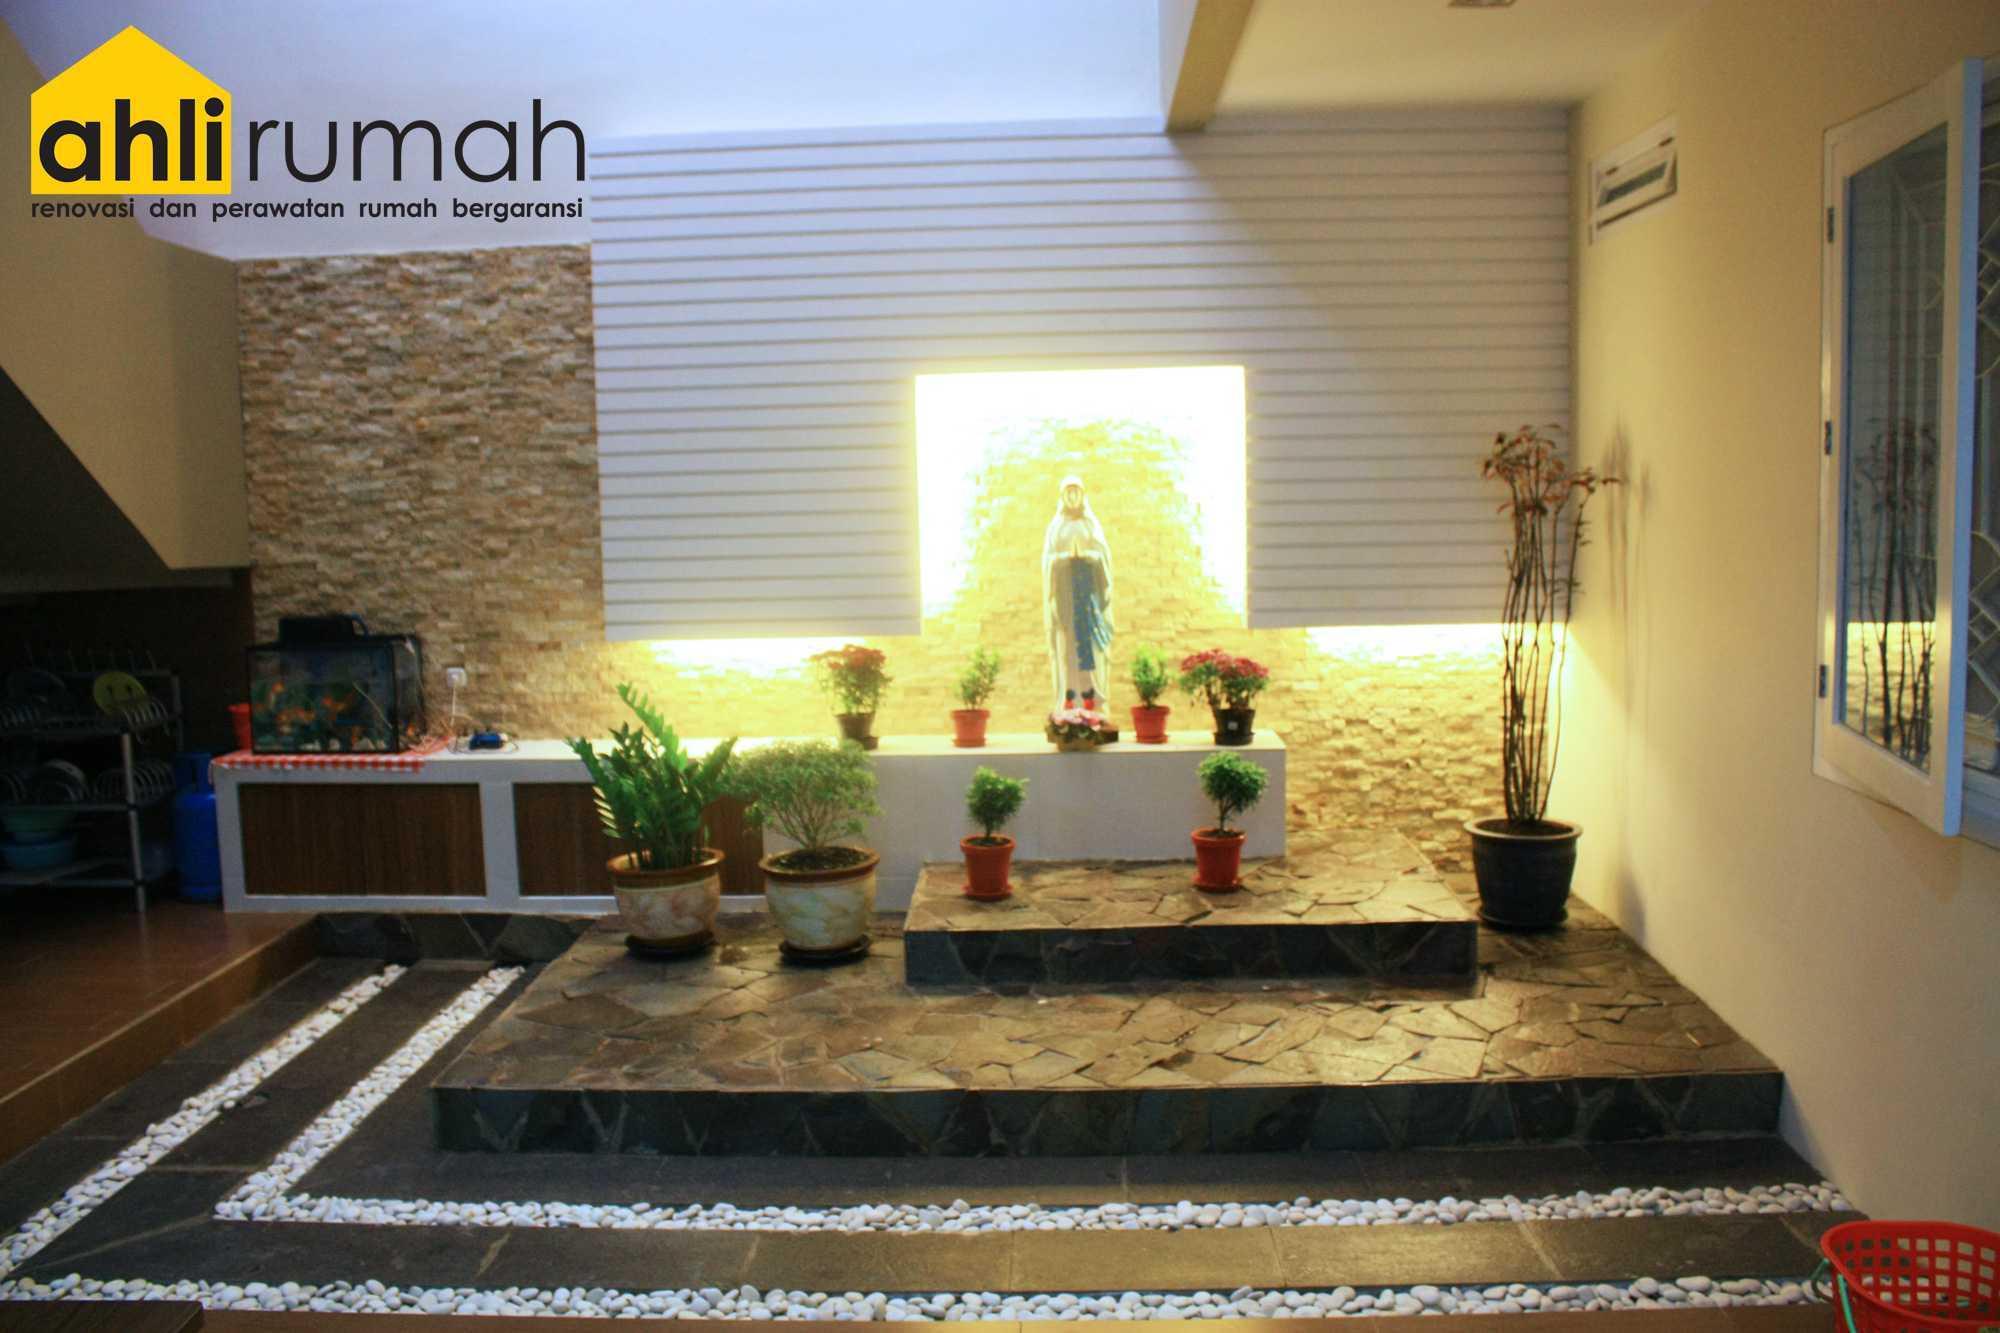 Ahlirumah.id Interior - Rumah Ibu C Daerah Khusus Ibukota Jakarta, Indonesia  Inner Courtyard Kontemporer  49168